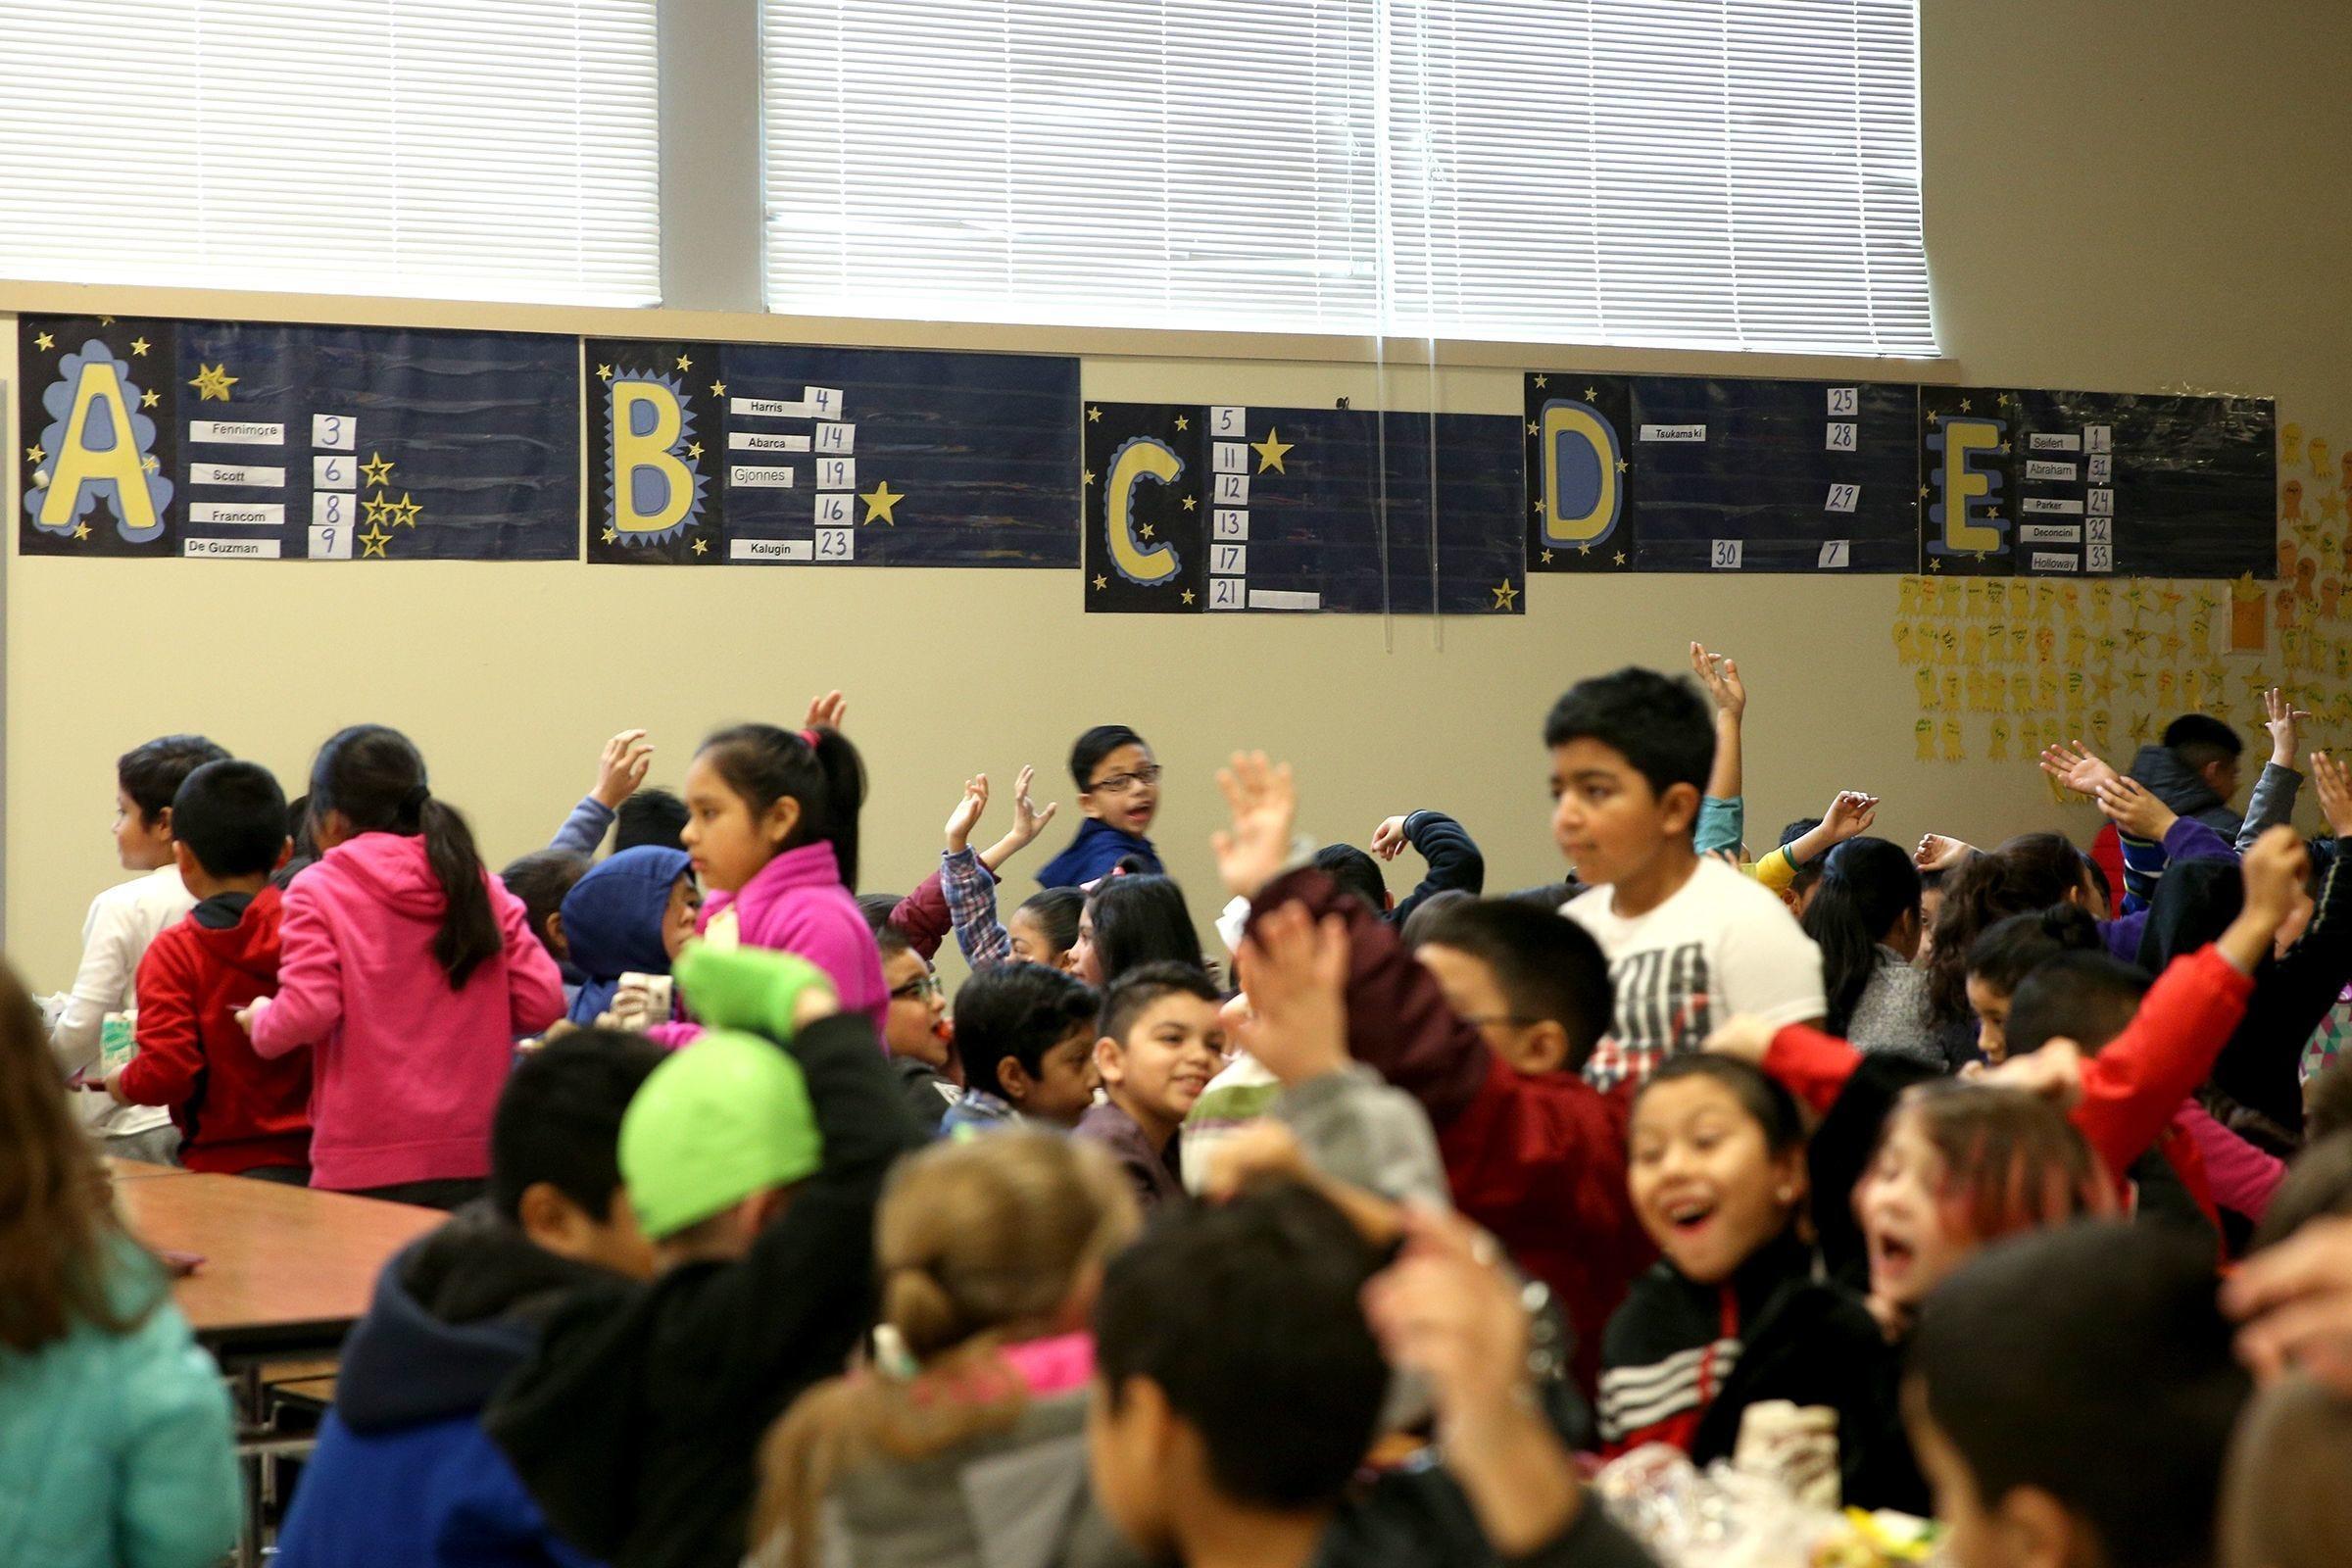 Salem-Keizer Public Schools offers kids free summer meals